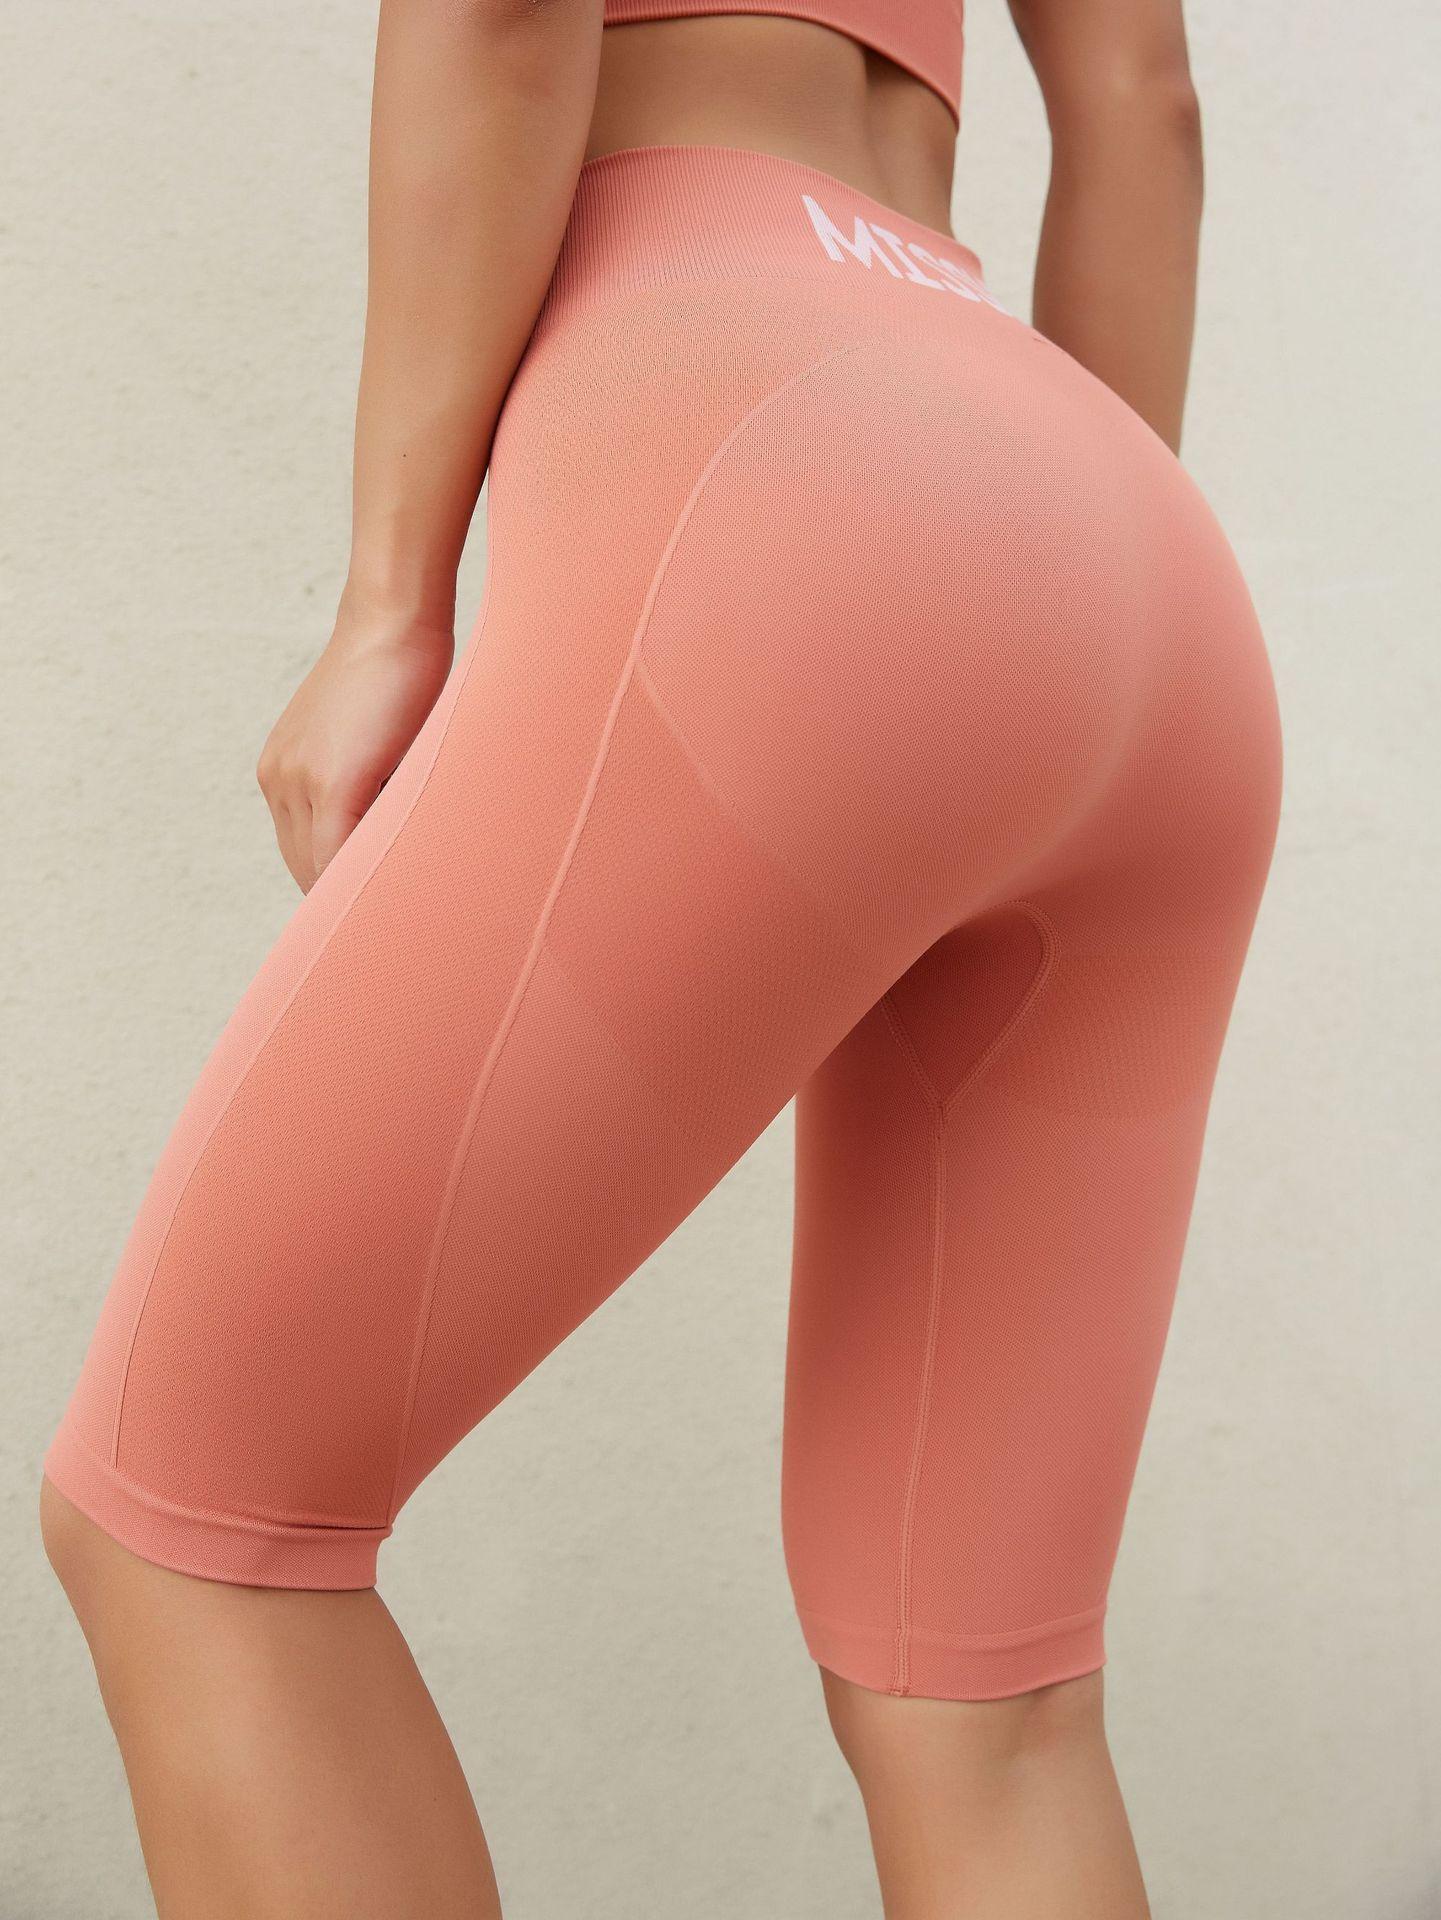 Wmuncc Seamless Leggings Women High Waist Push Up Knee Length Running Sports Shorts Tights Workout Gym Yoga Tummy Control Pant 1